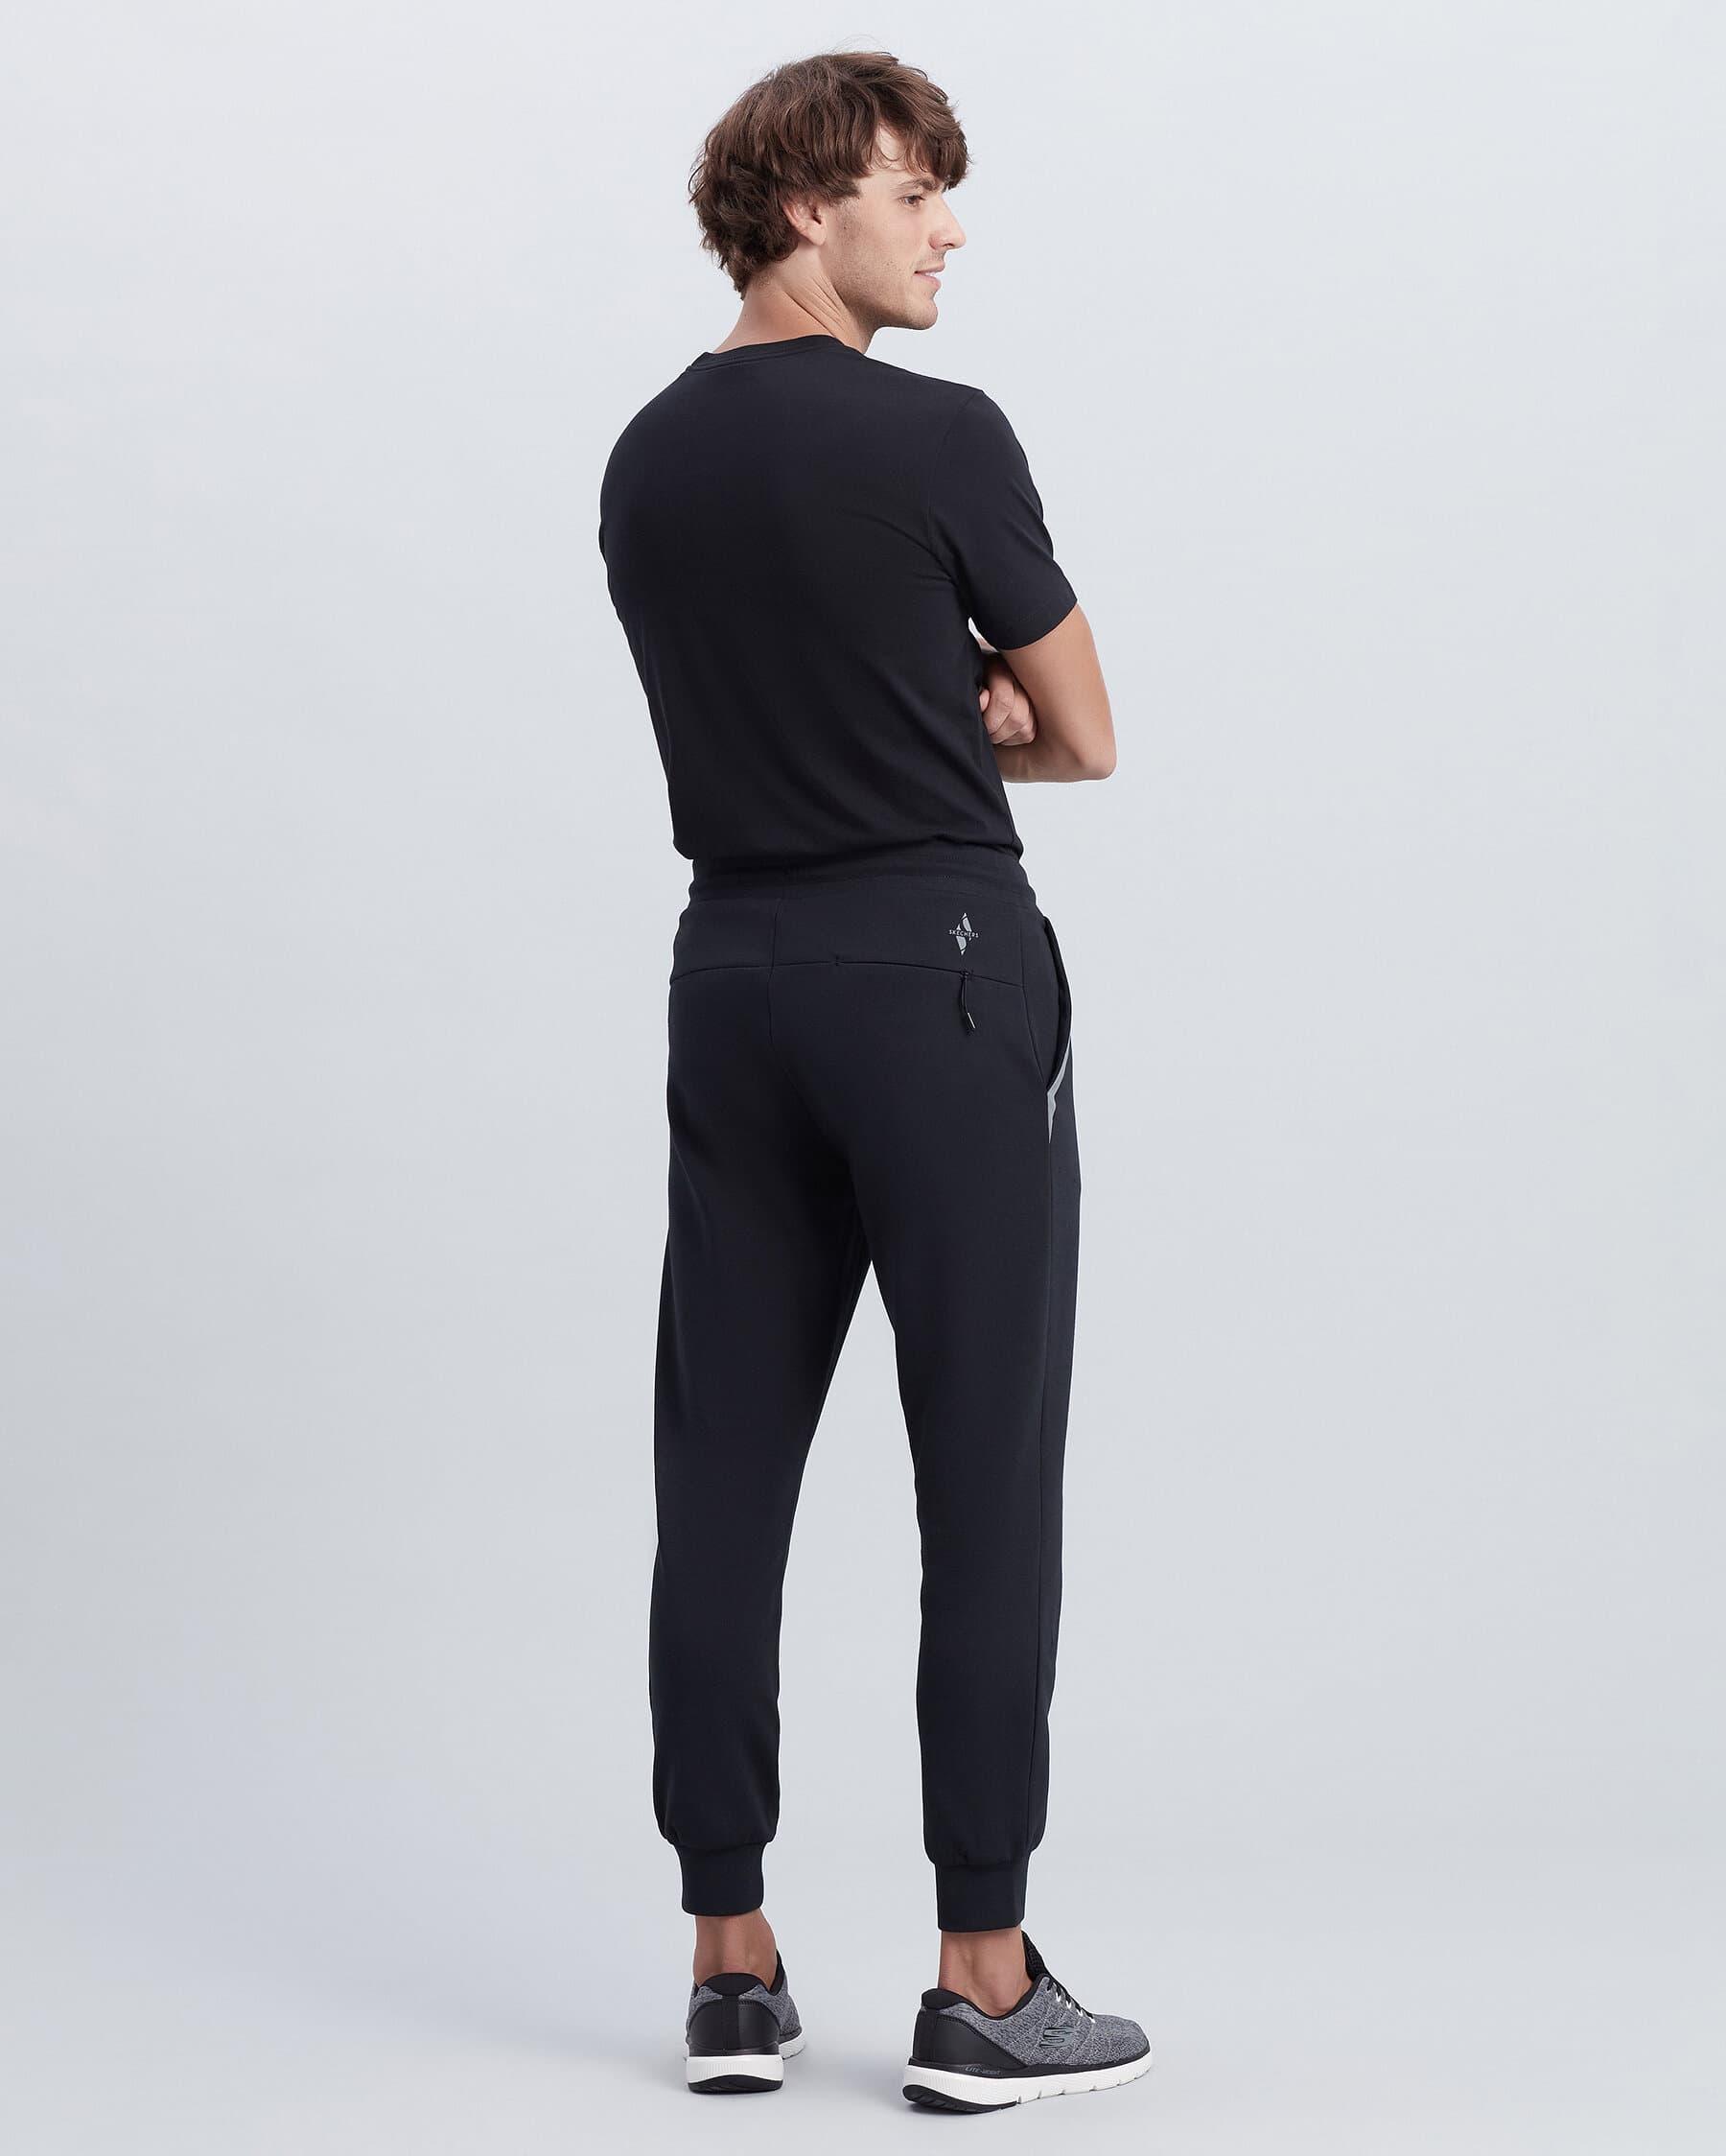 Flexi Jogger Erkek Siyah Eşofman Altı (S212255-001)